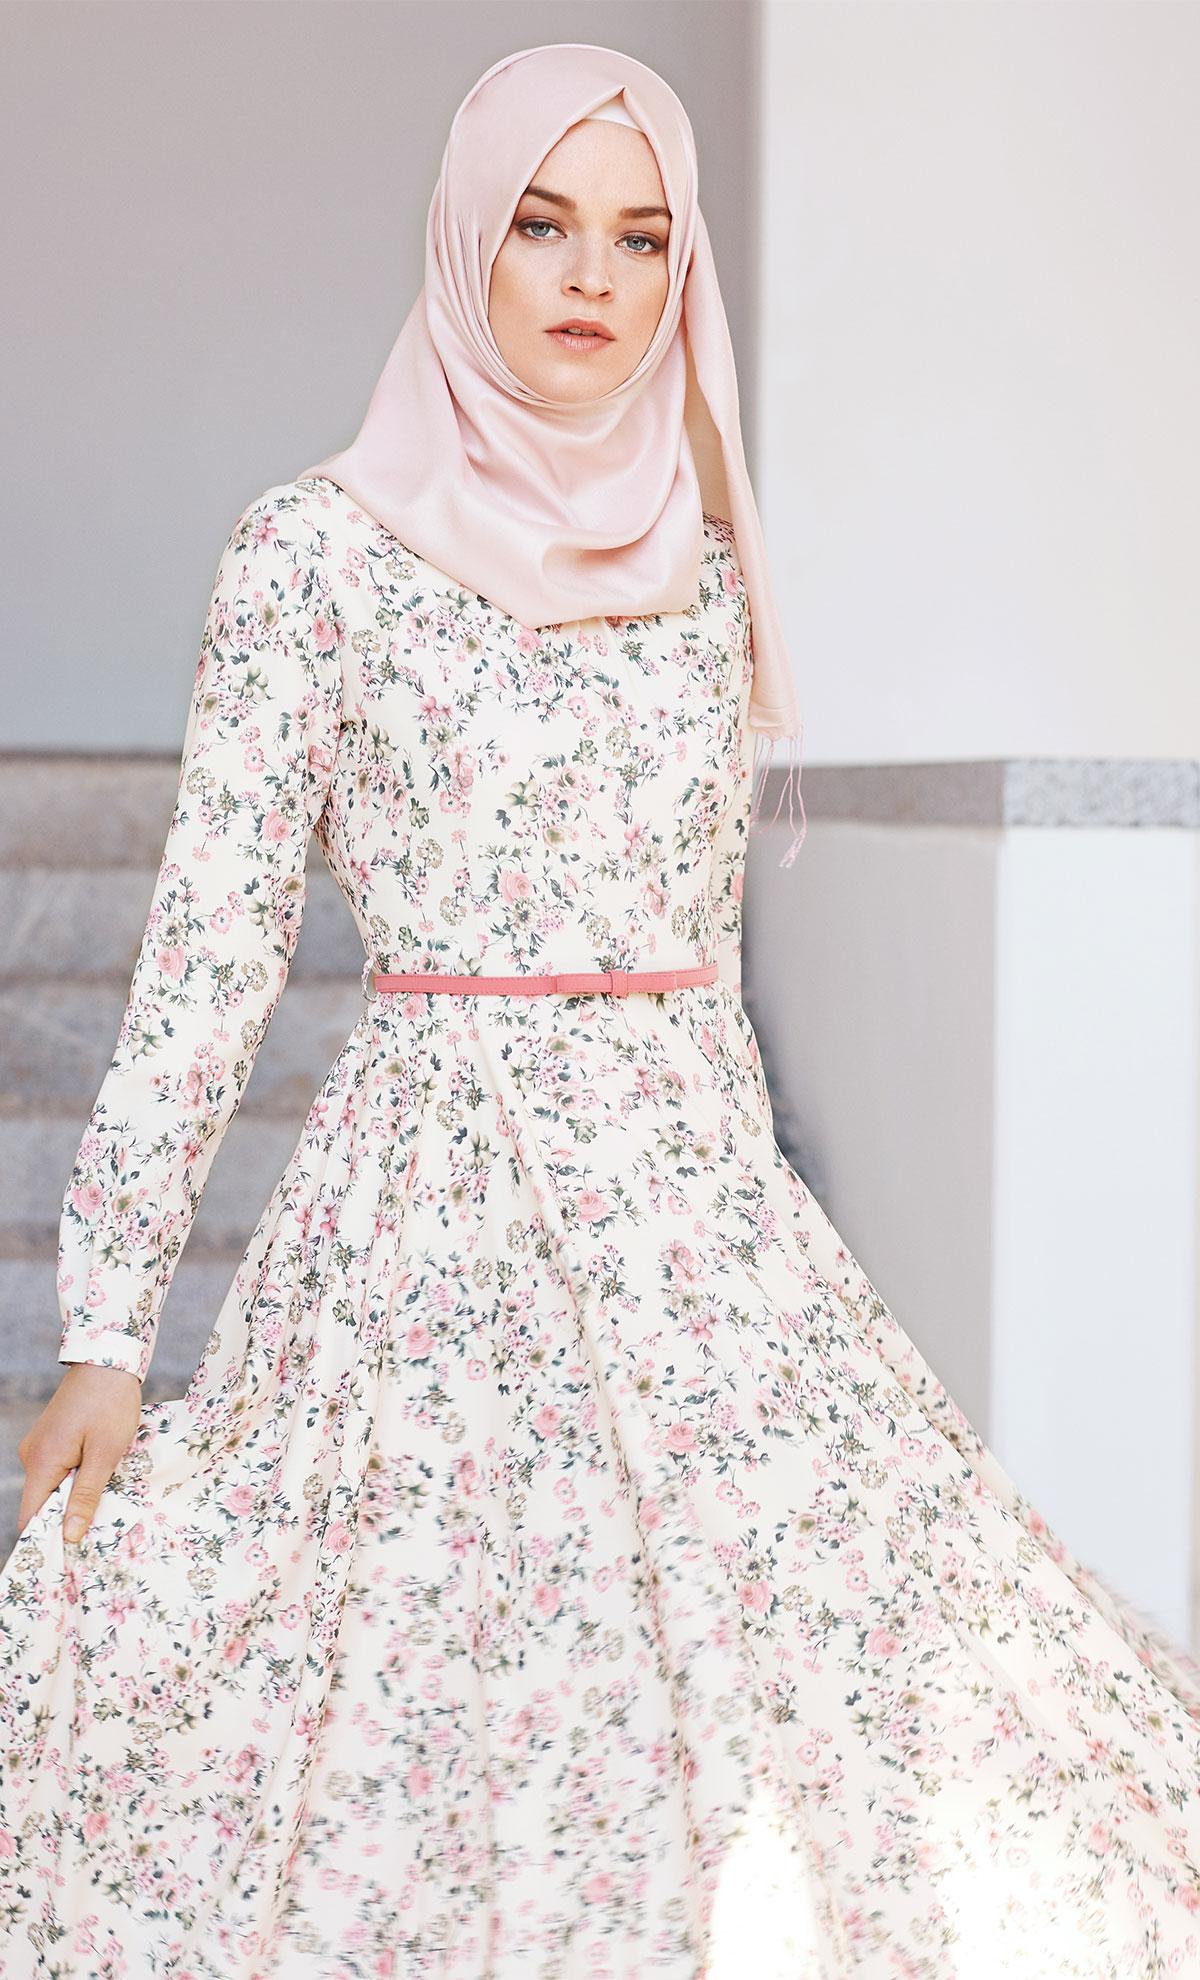 c351e777e Tuğba çiçekli elbise modelleri